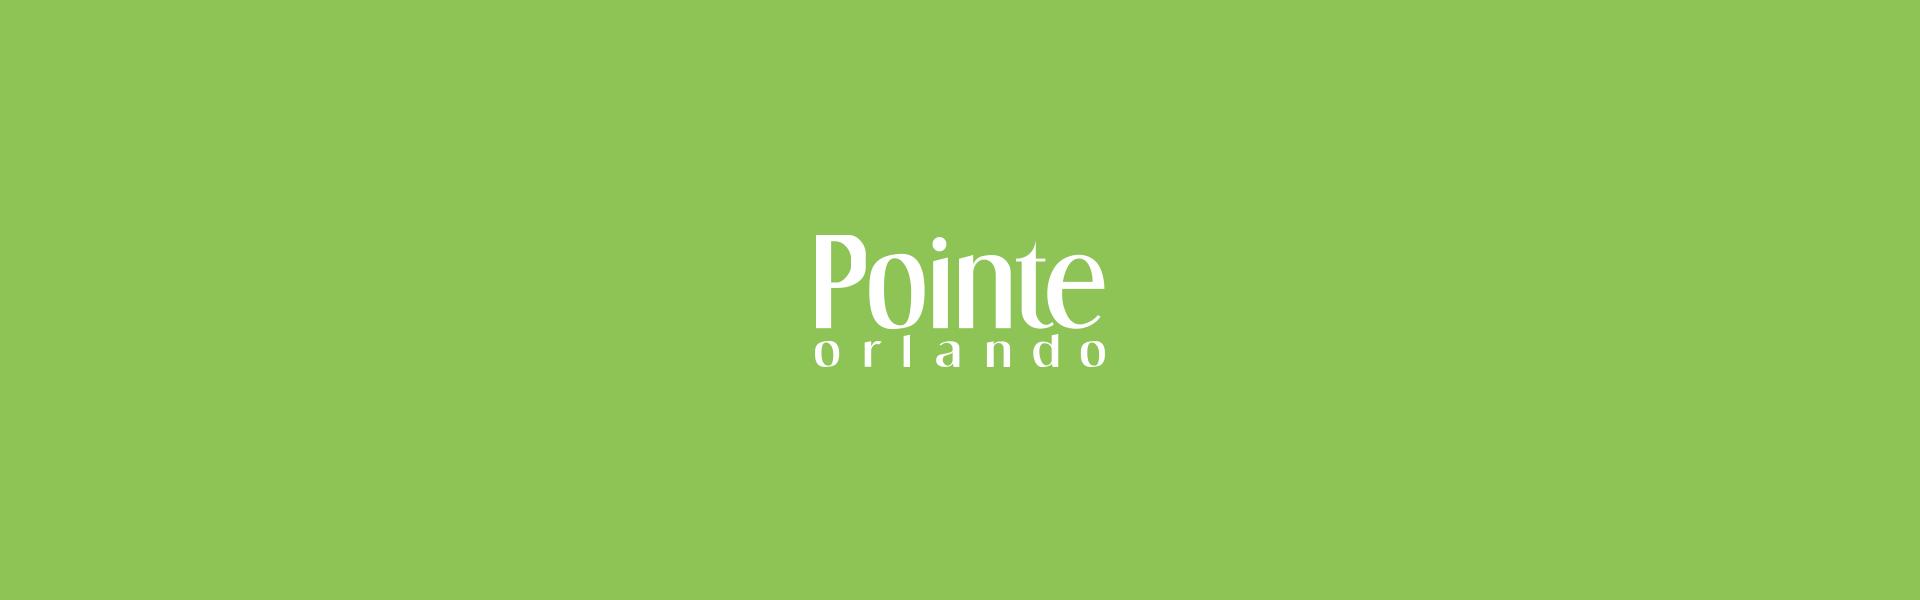 Pointe Orlando